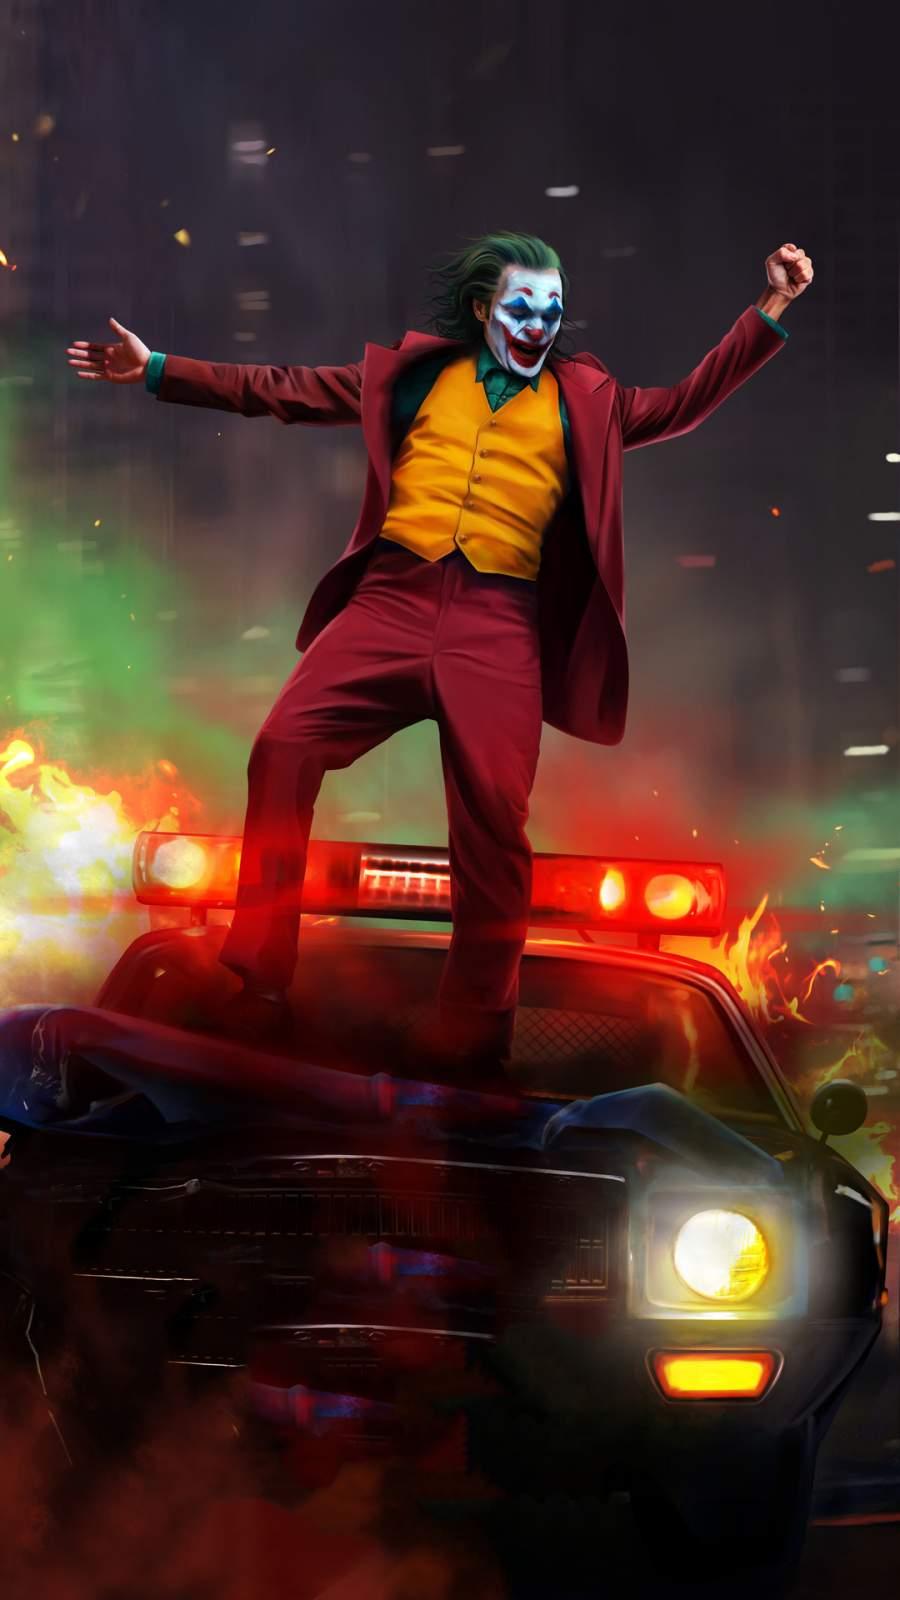 Joker vs Police iPhone Wallpaper